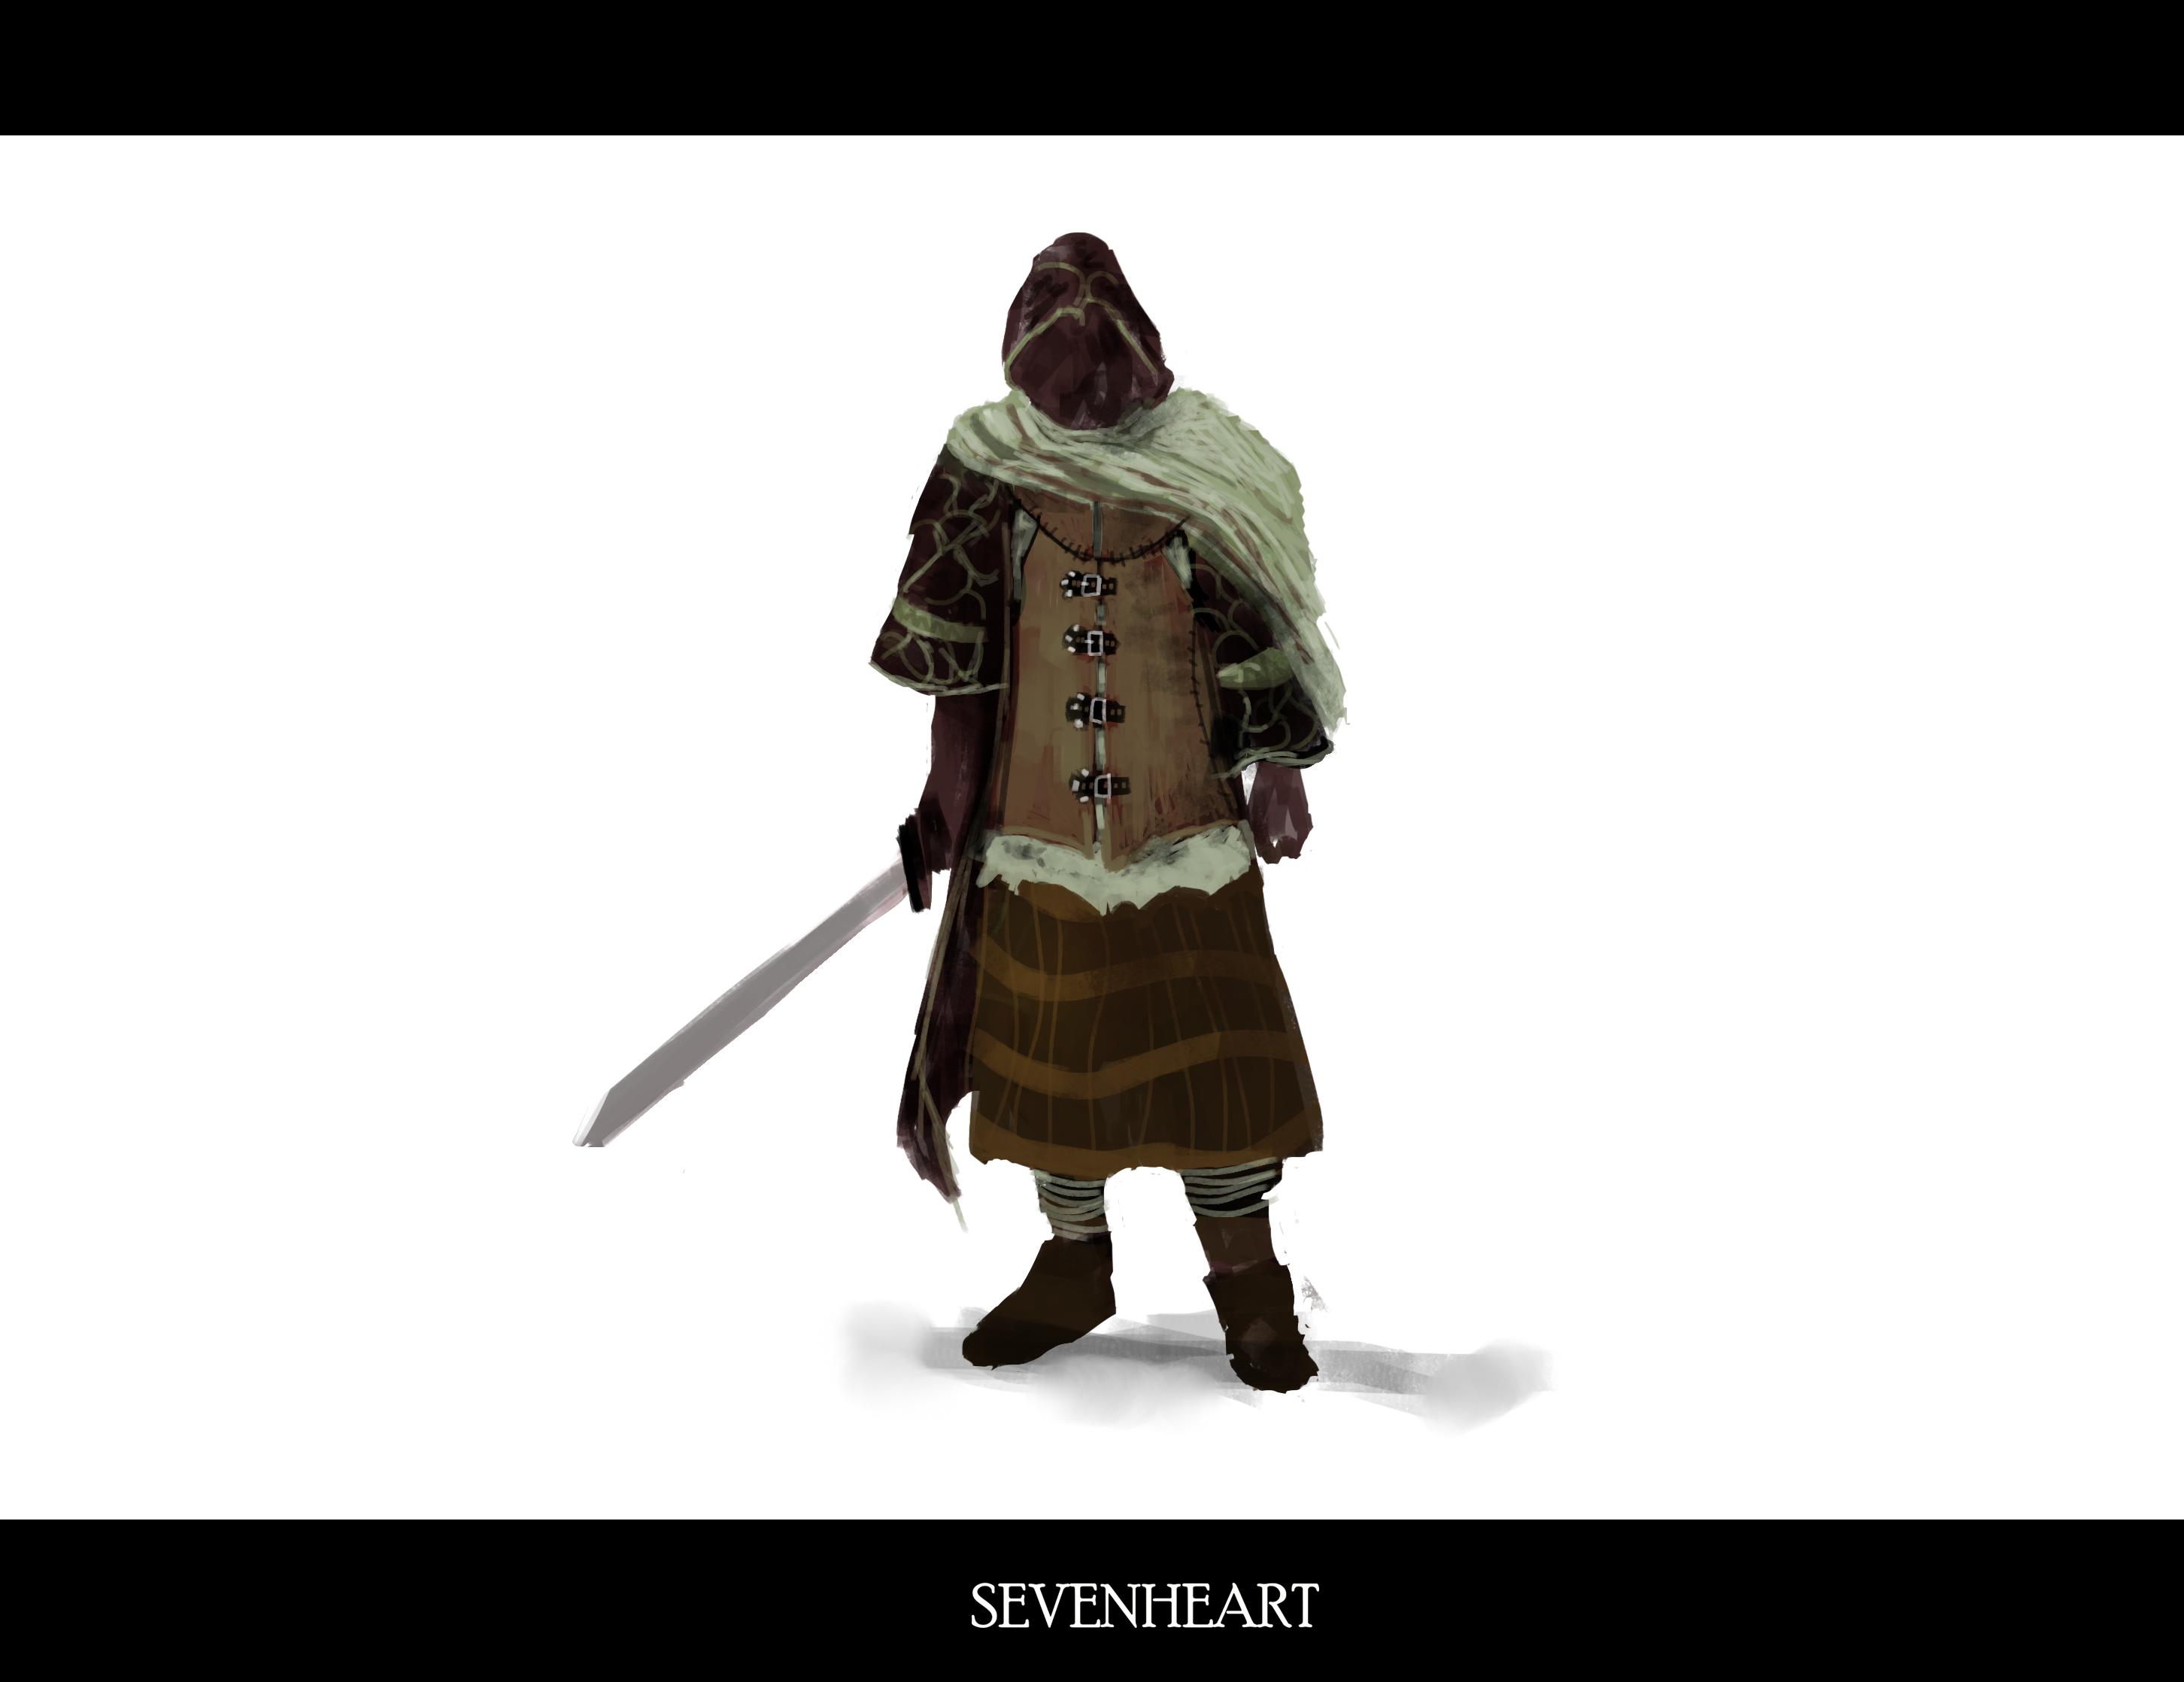 [SP][EN] Sevenheart Outfitsgc